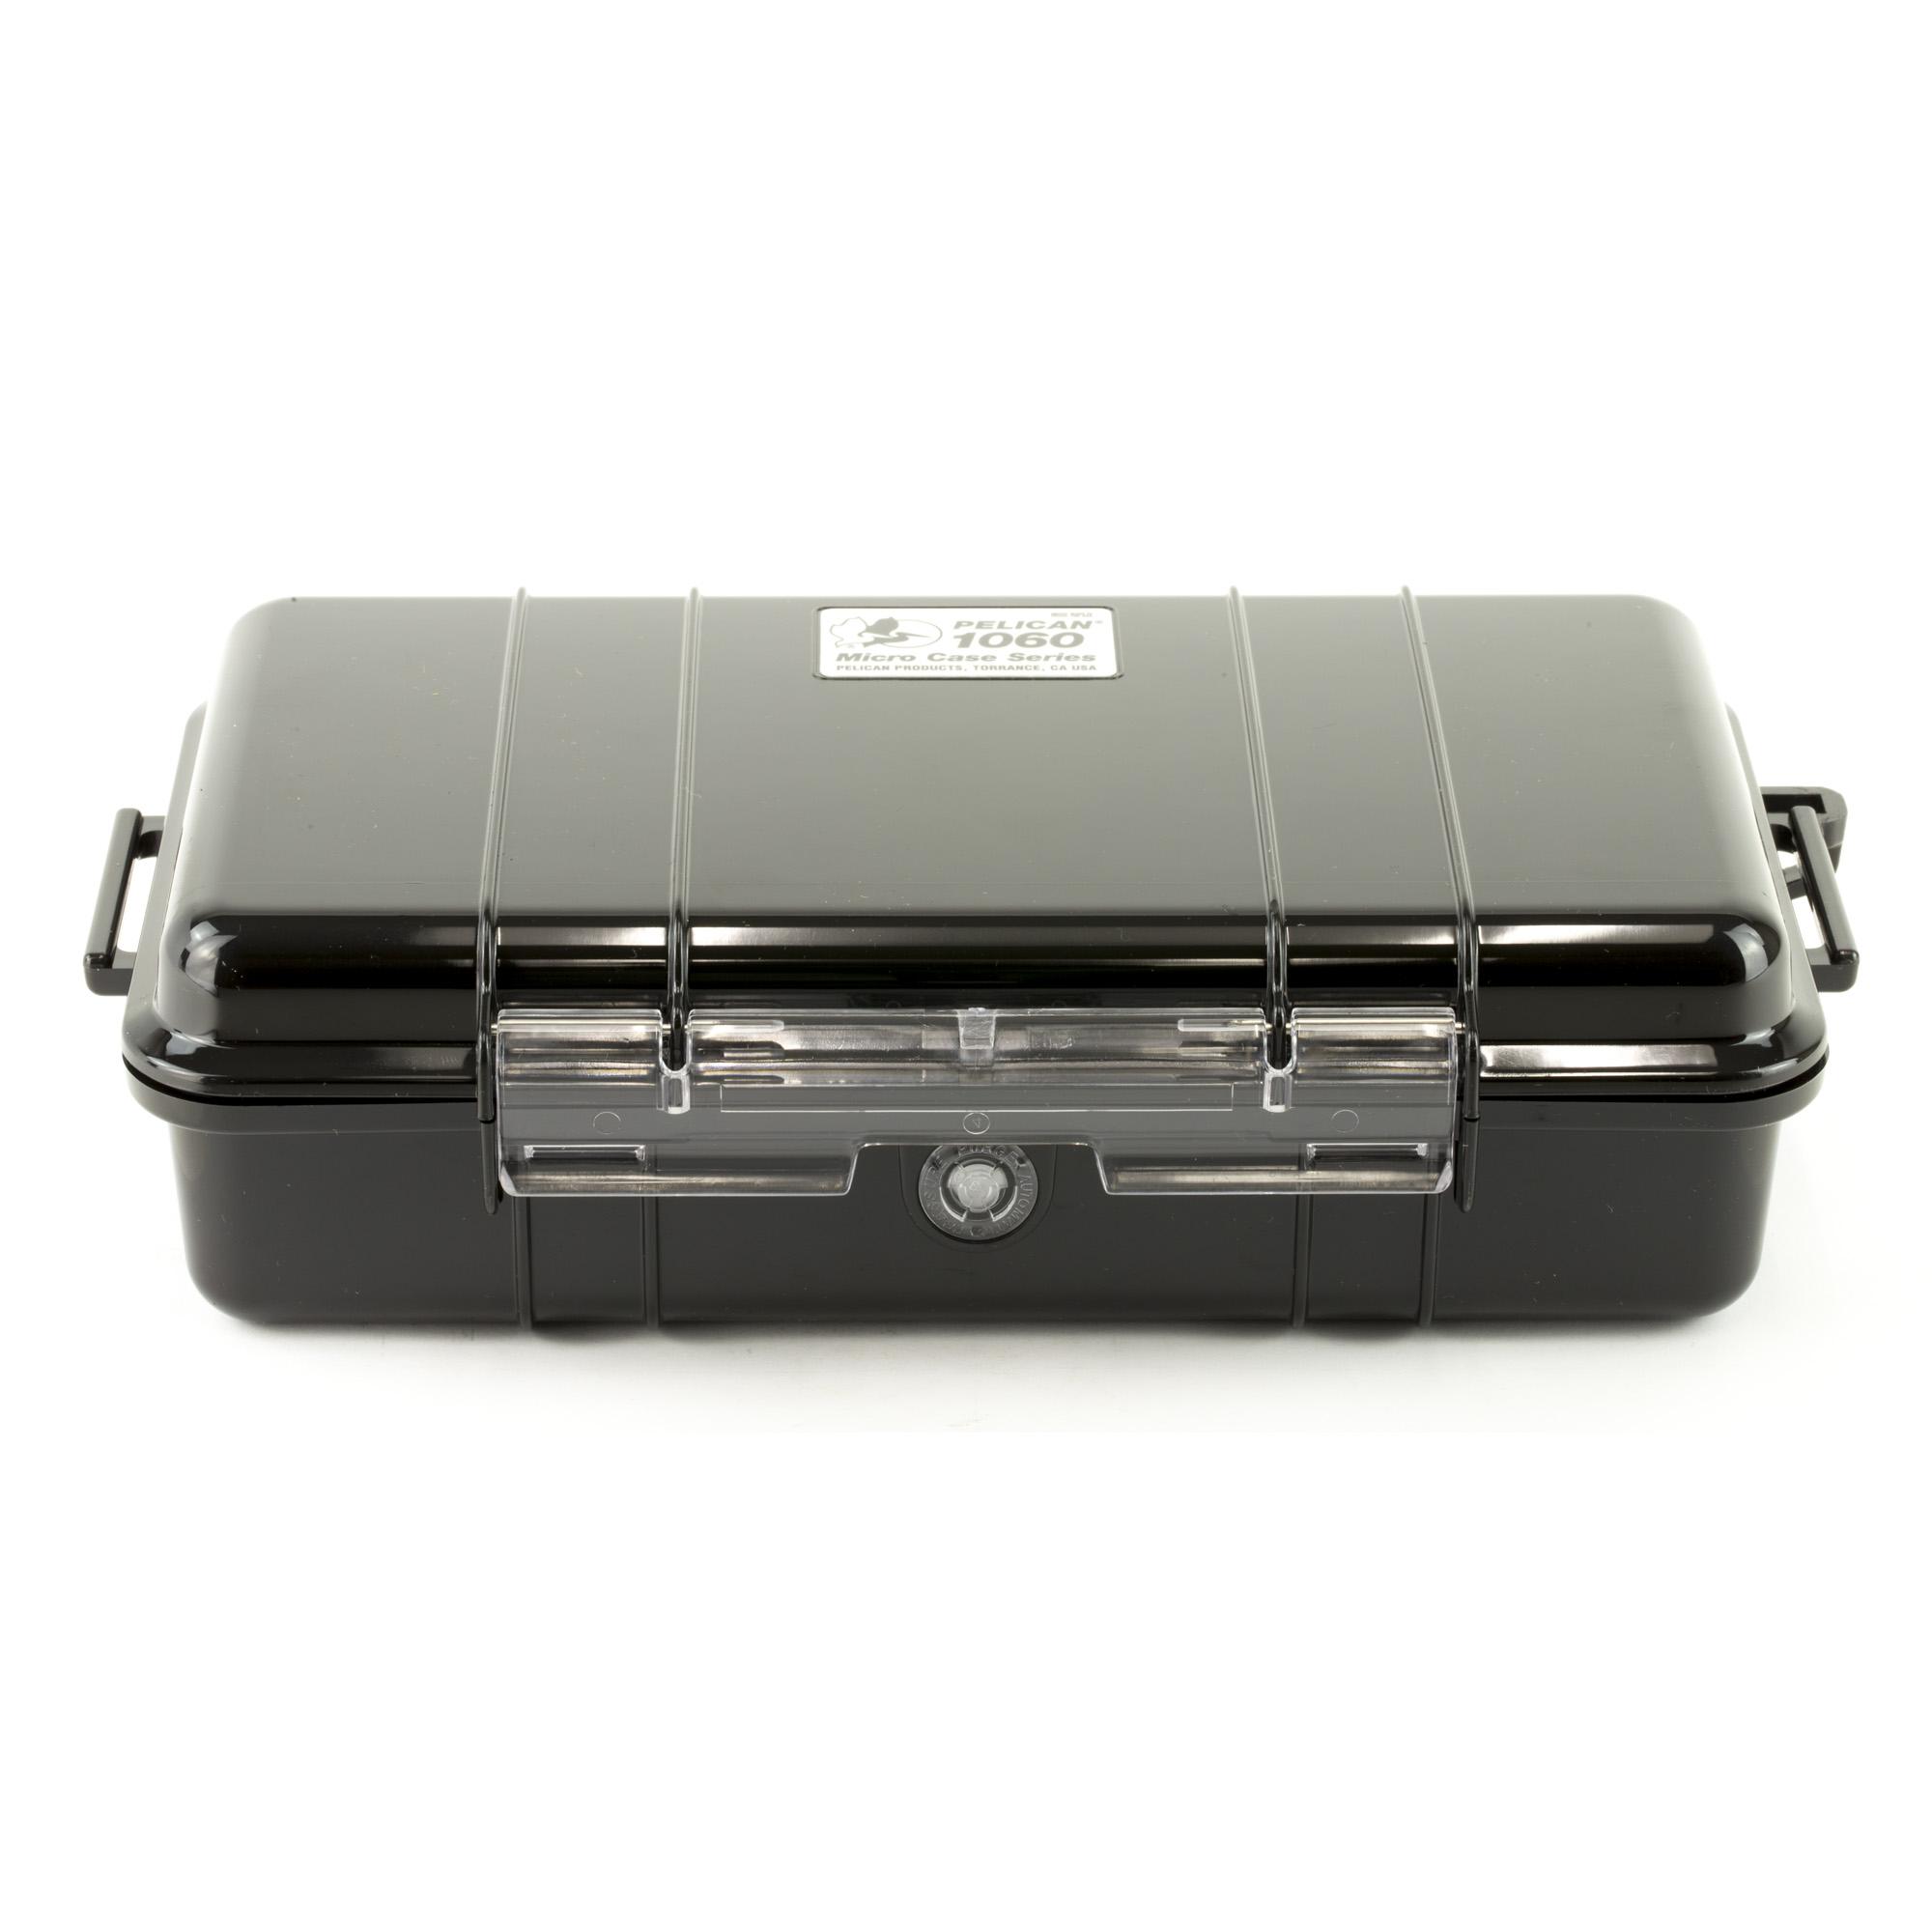 Pelican Case 8.25 X 4.25 X 2.25 Blk